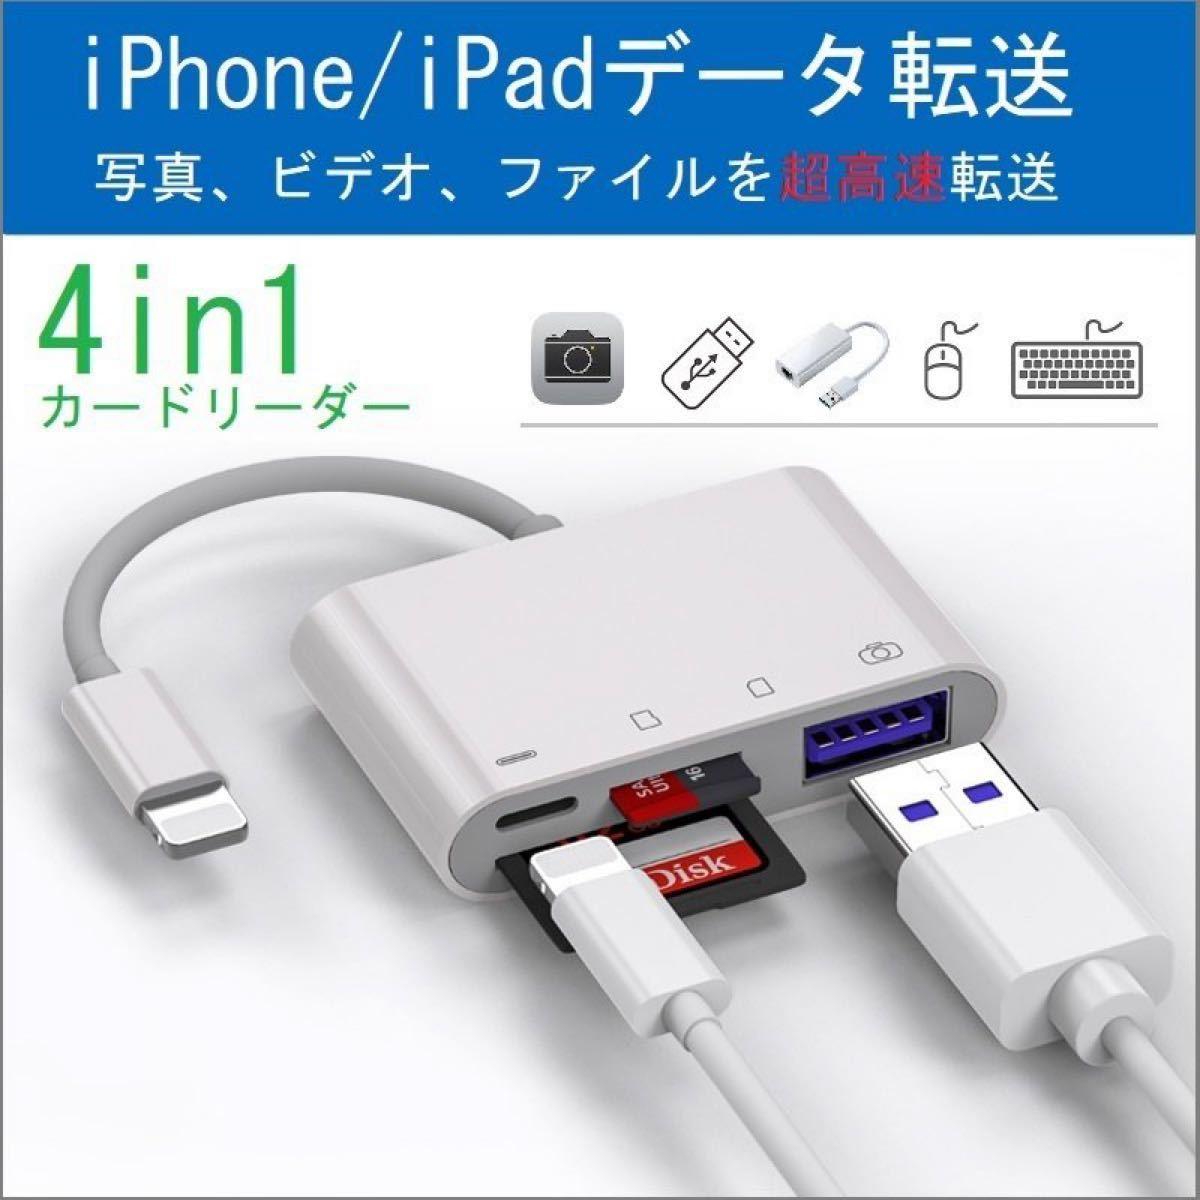 iPhone SD カードリーダー SD/TF カードリーダー